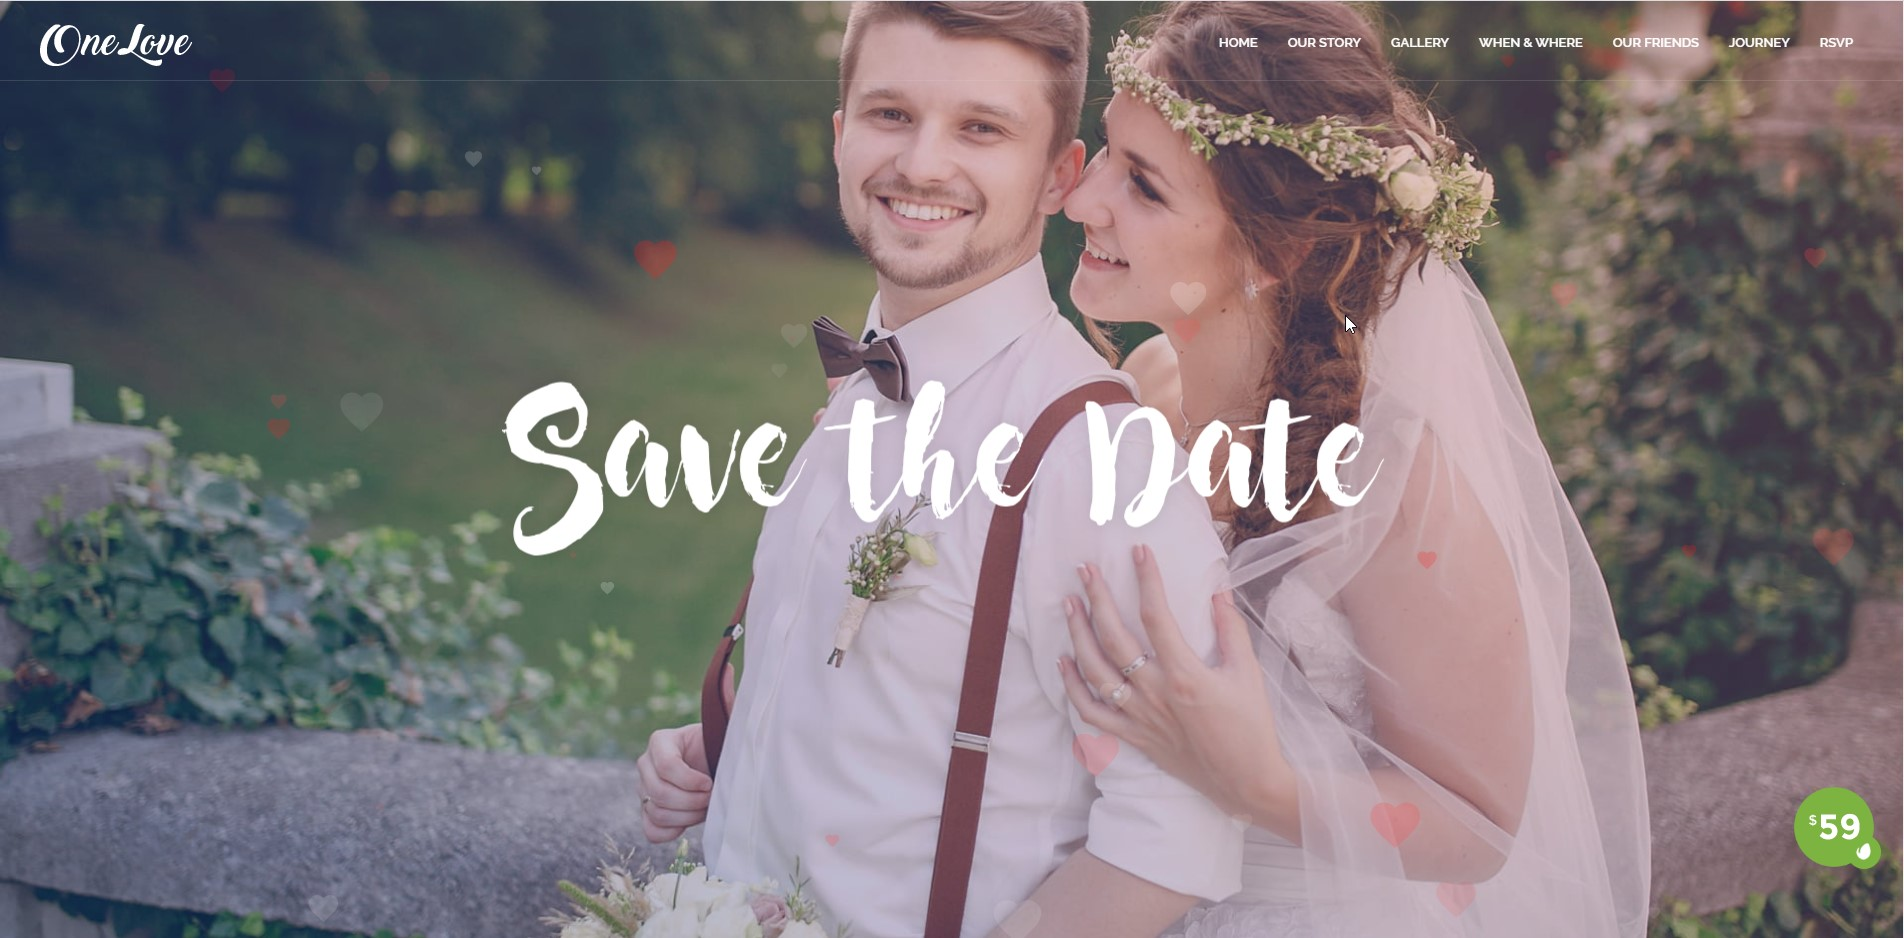 One Love - Multipurpose Wedding WordPress Theme